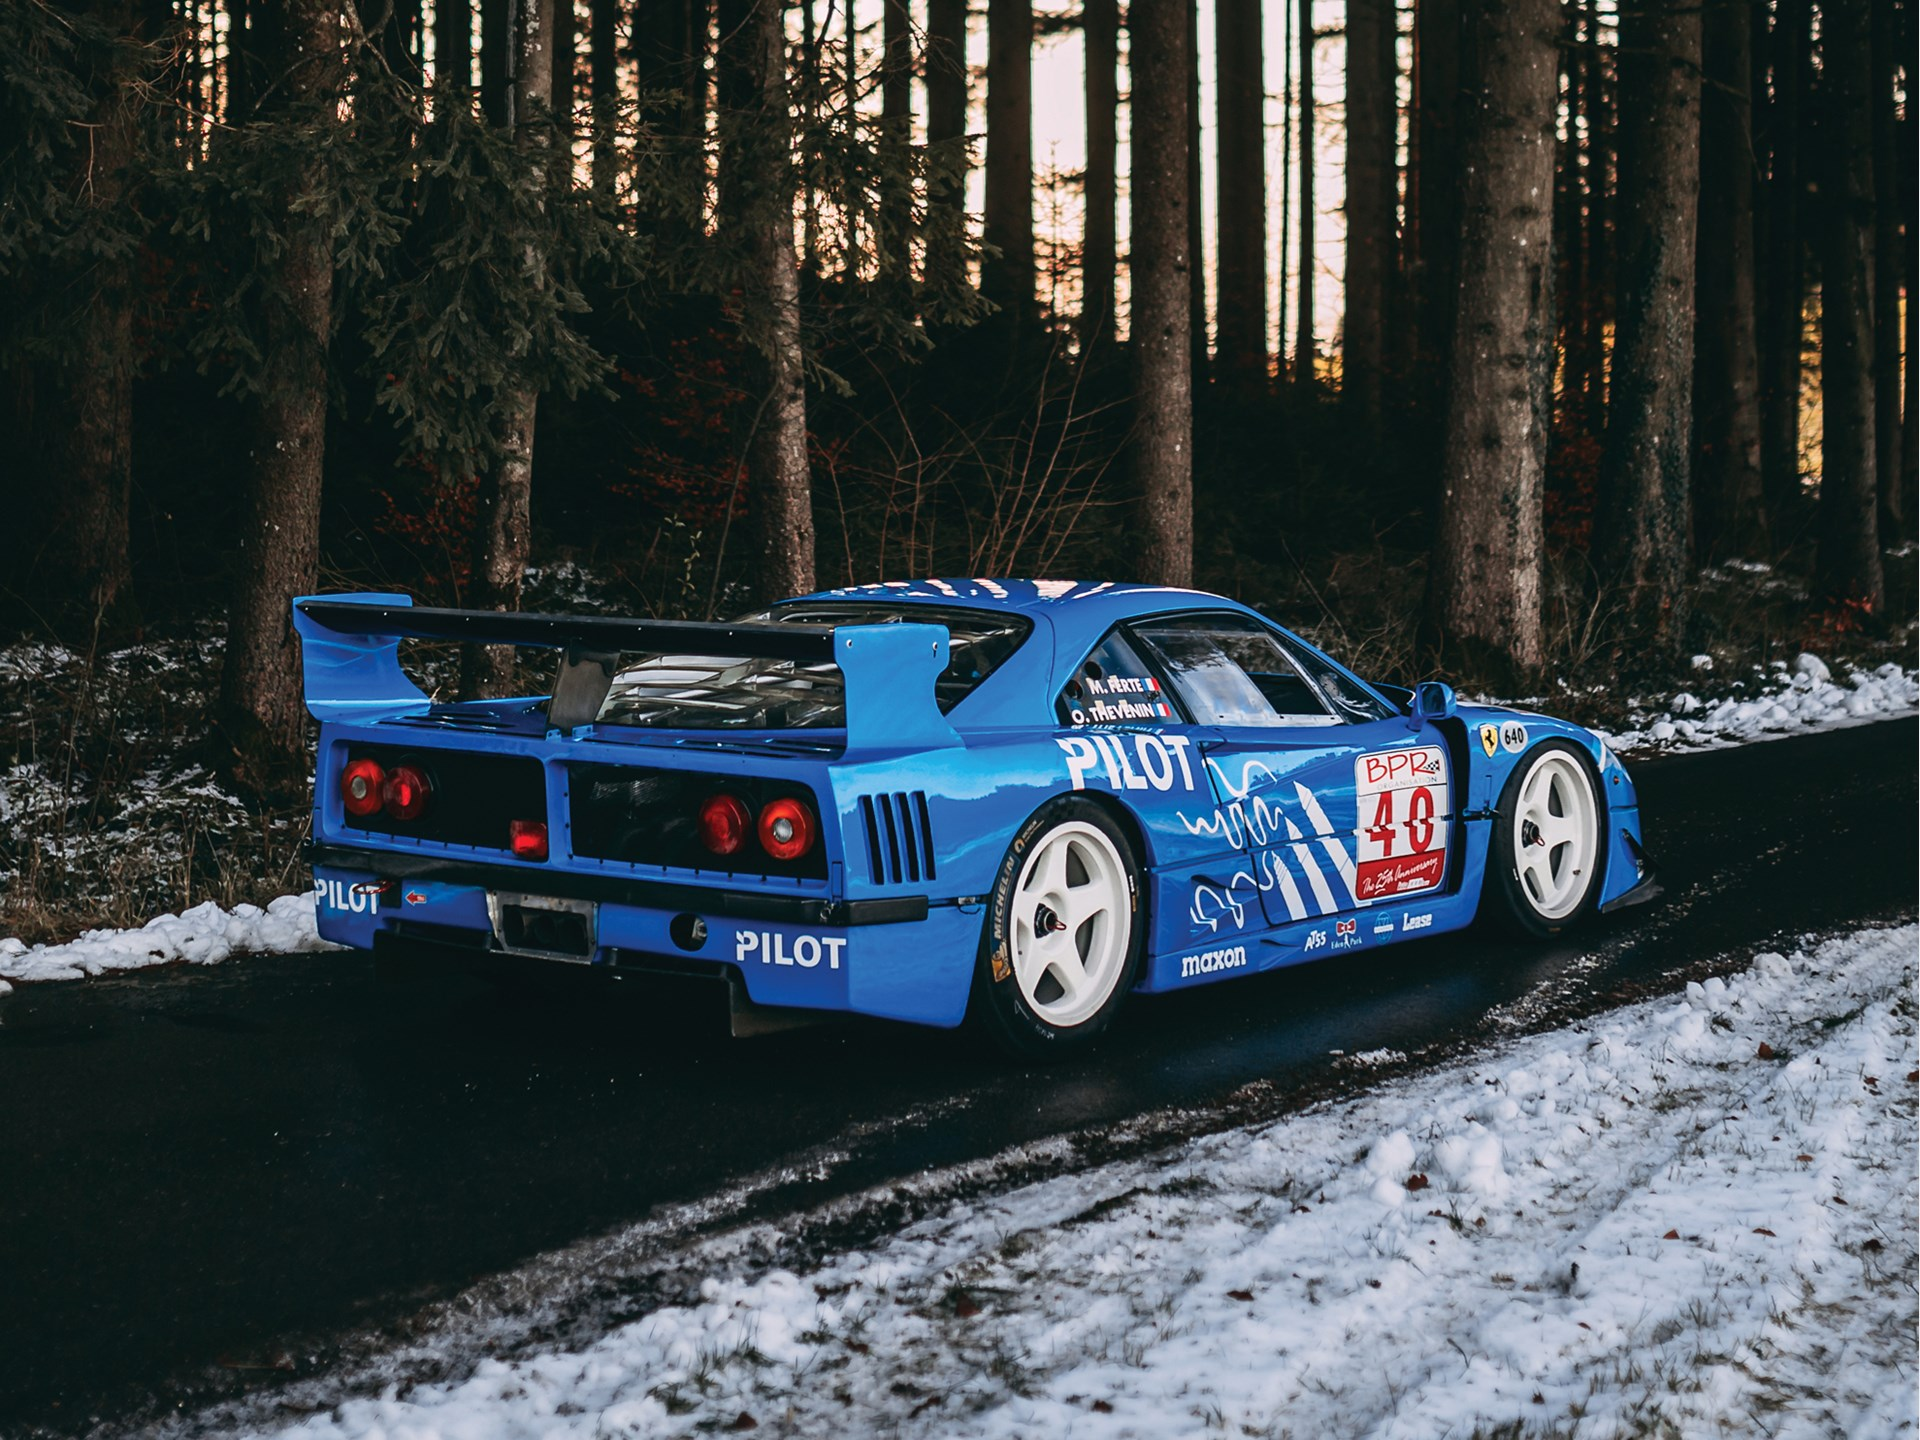 1987 Ferrari F40 LM rear 2/3 snow